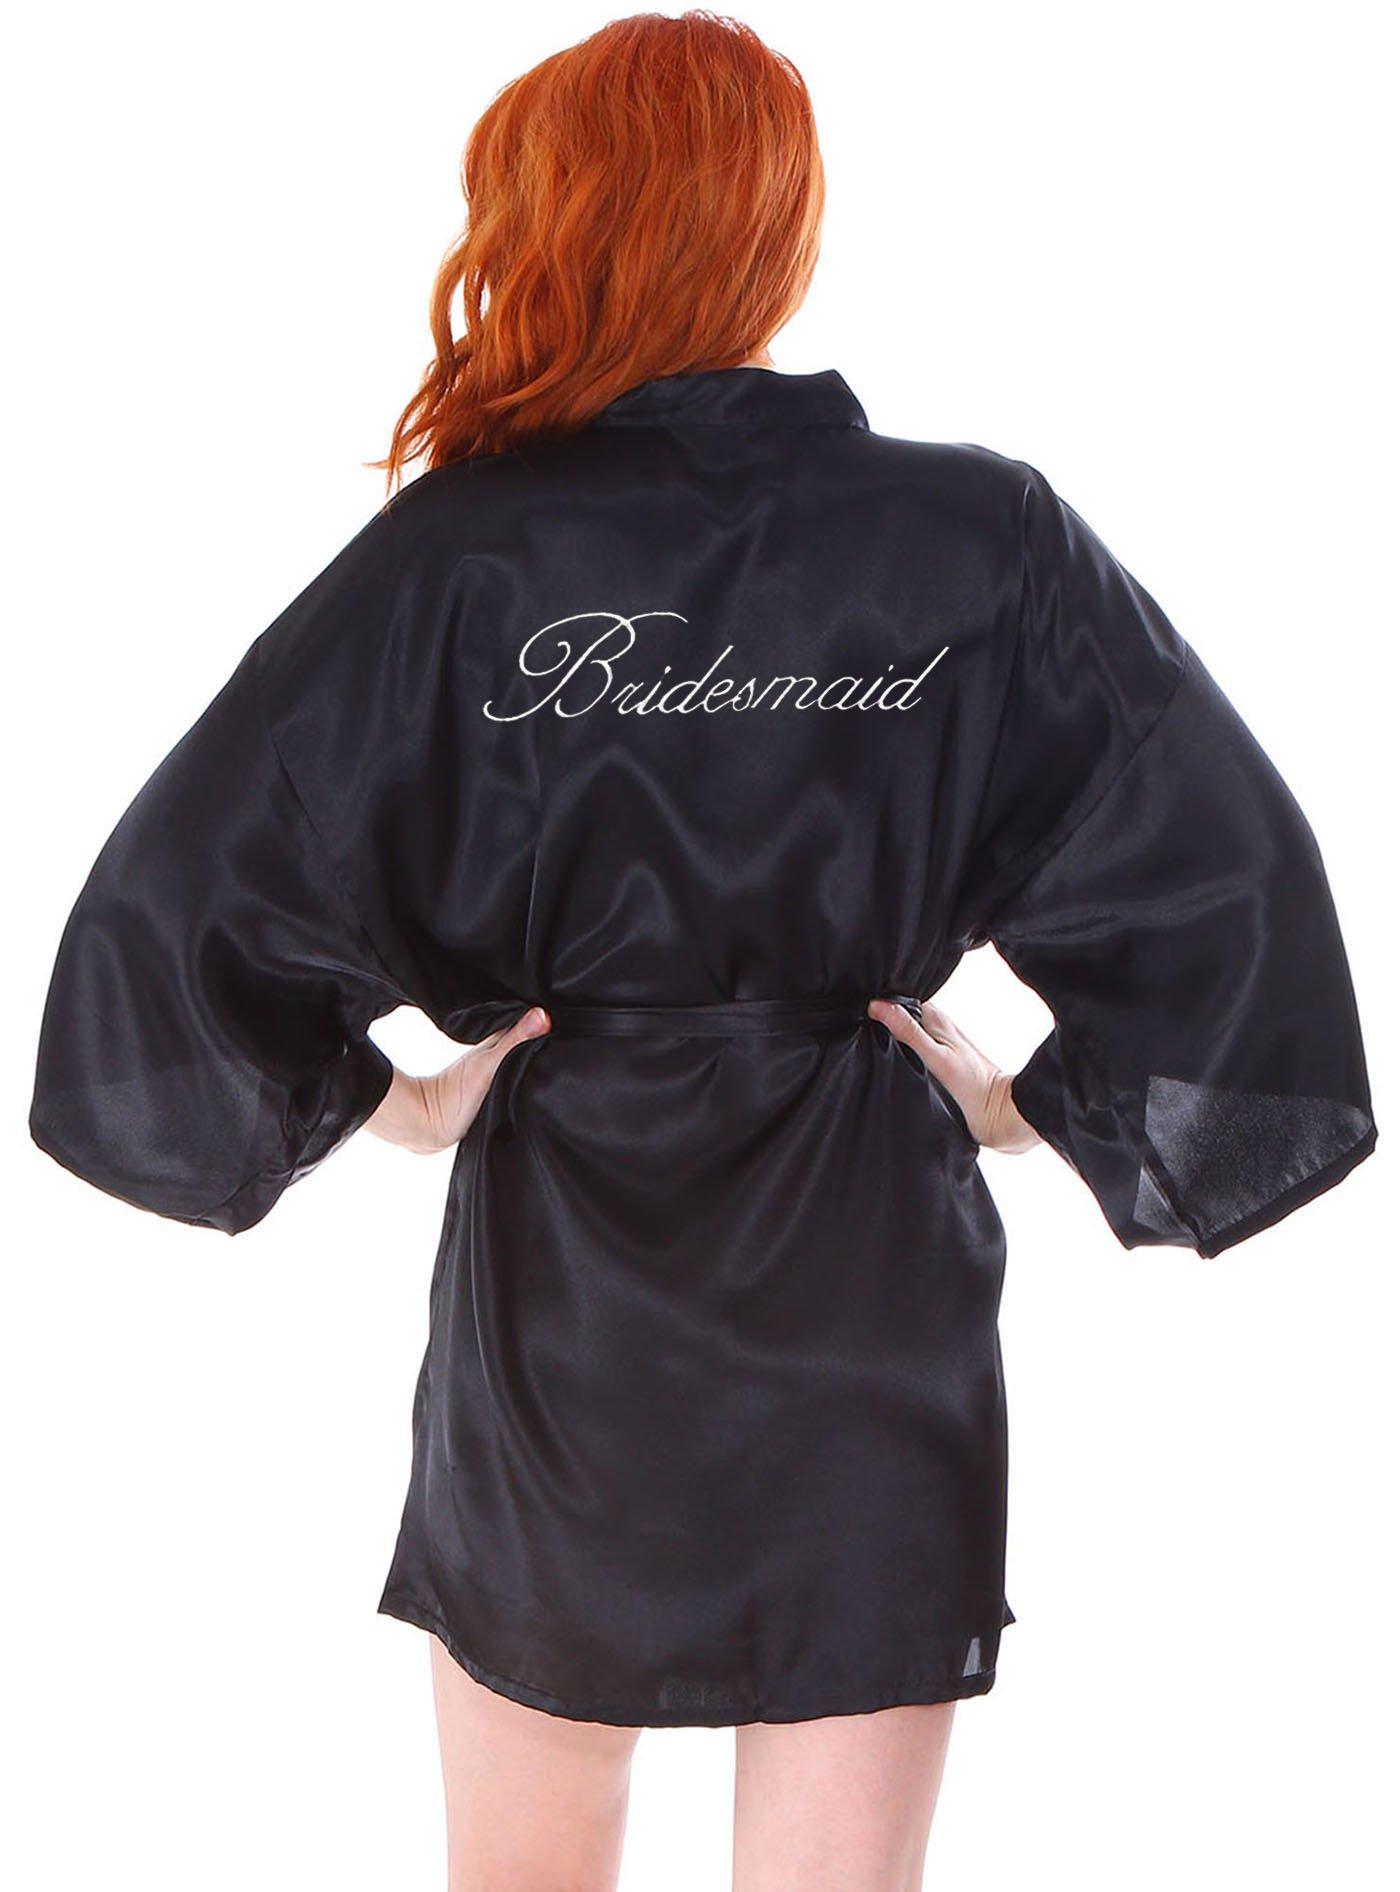 AshopZ Personalized Custom Embroidery Wedding Short Kimono Silk Satin Bathrobe Black